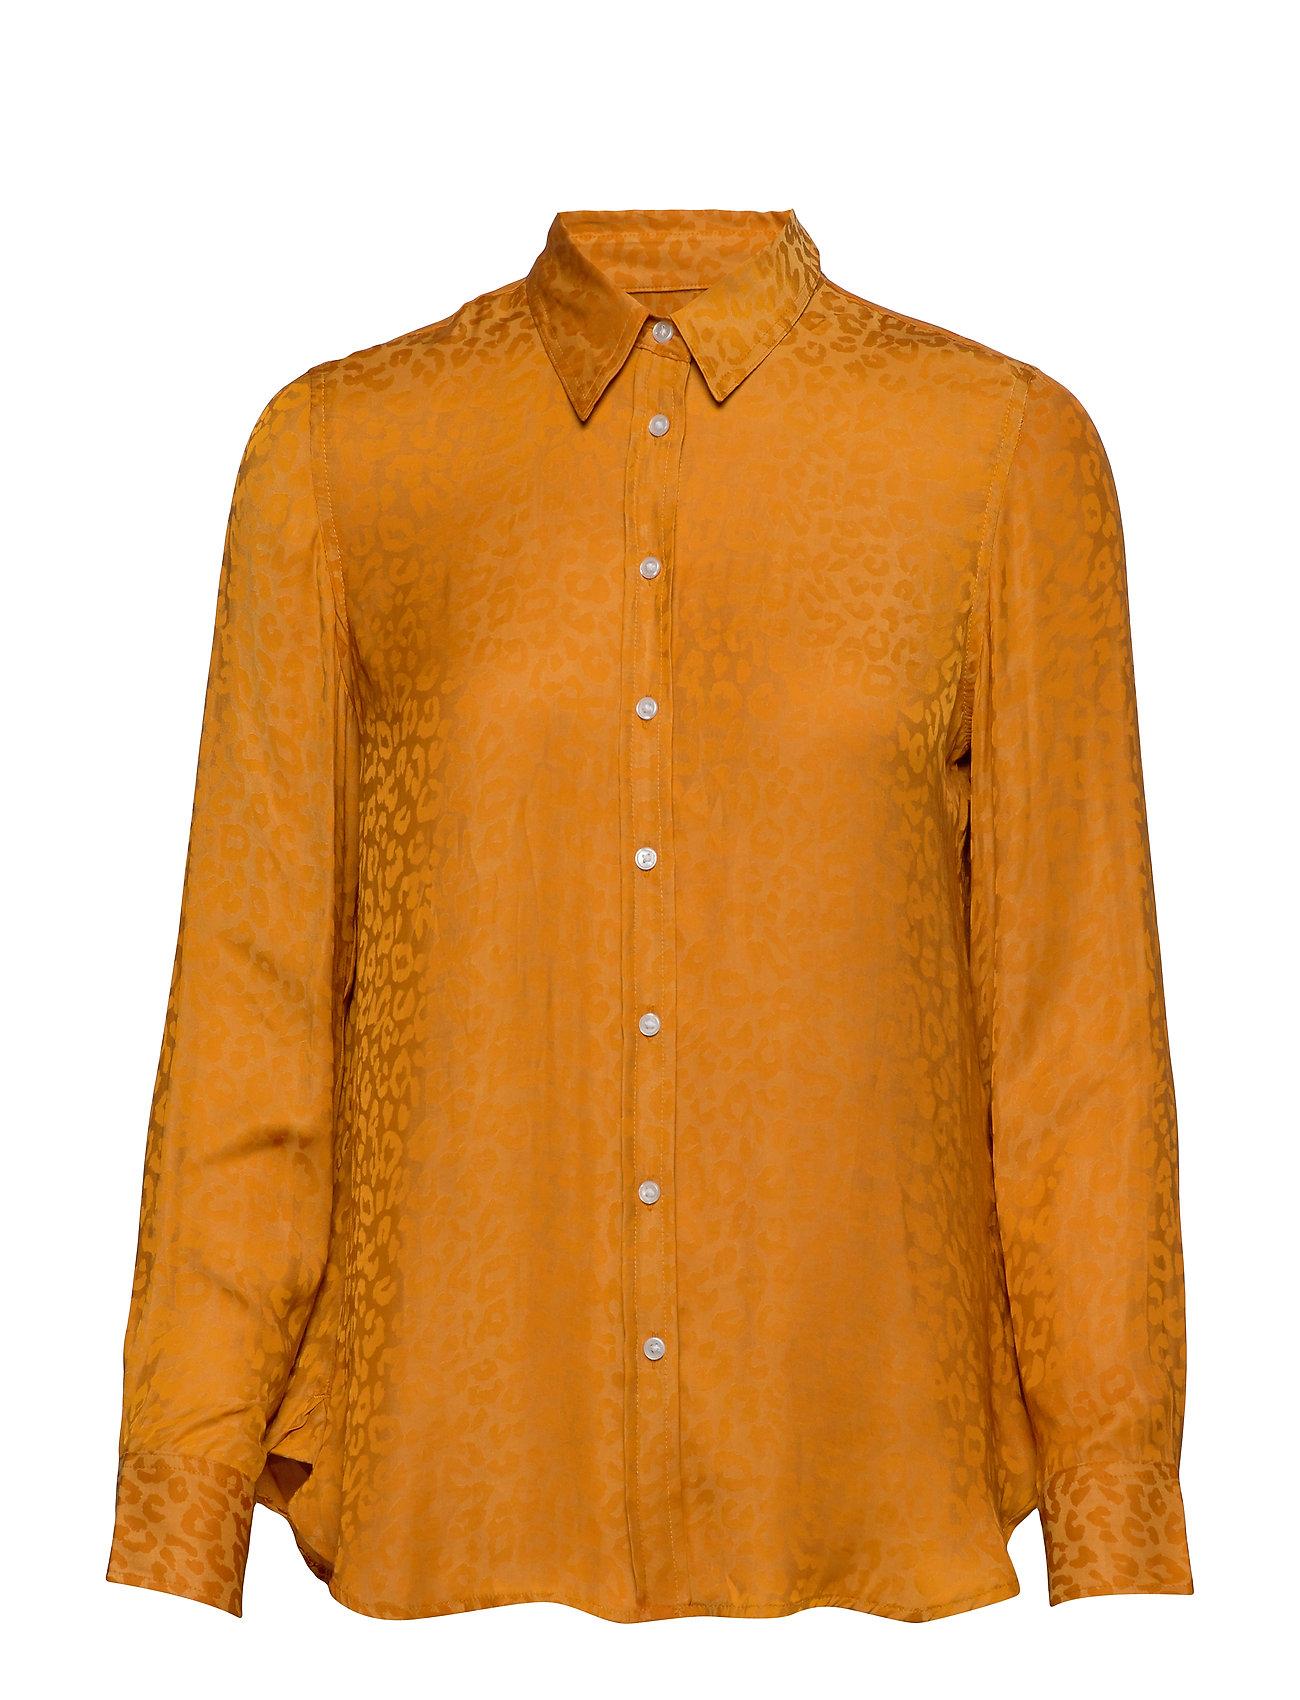 Banana Republic Dillon Classic-Fit Leopard Shirt - MUSTARD 515